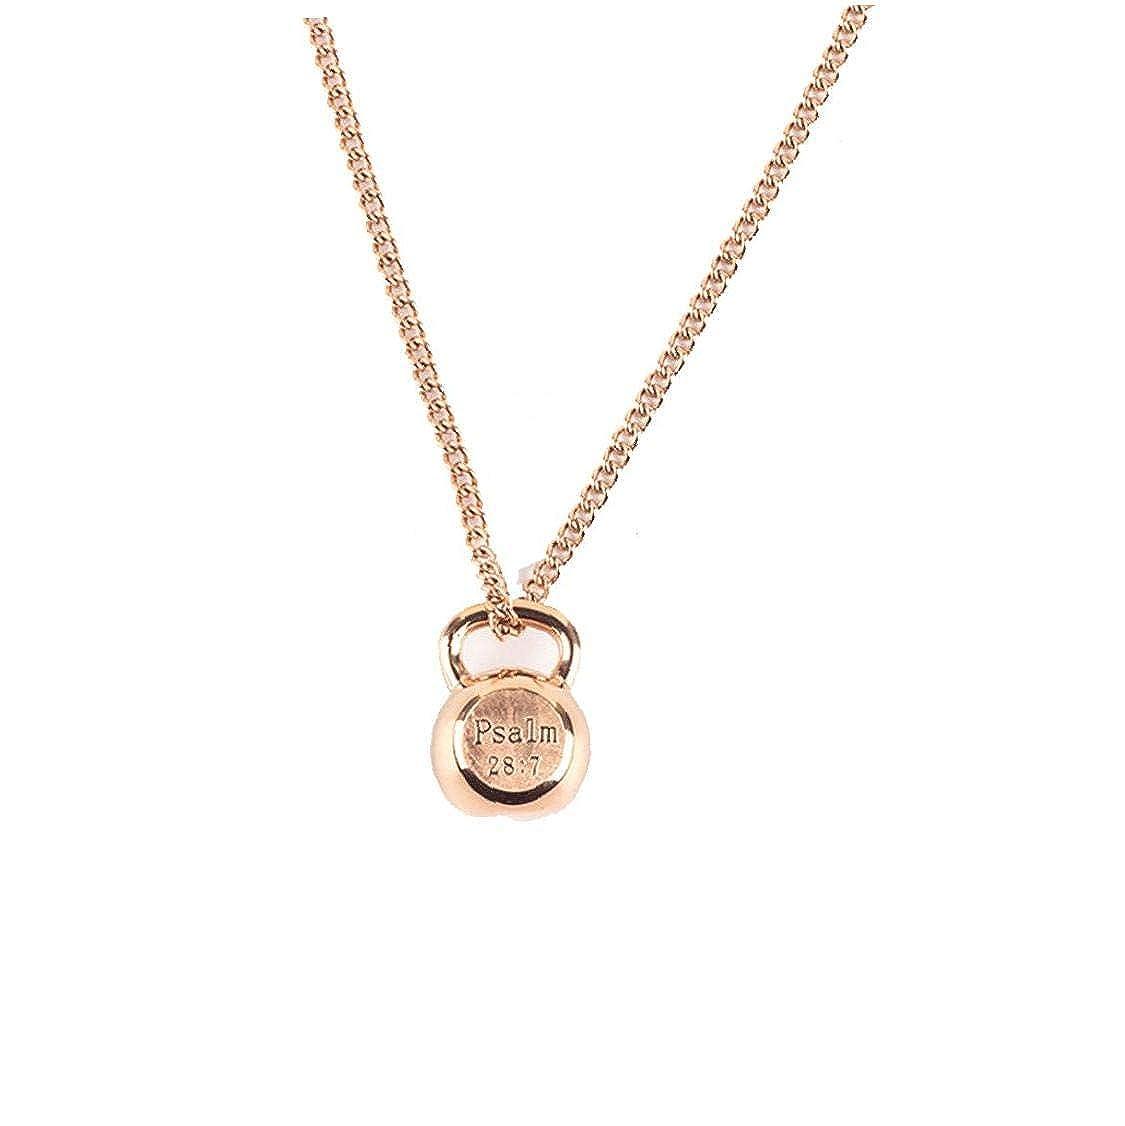 Women Men Titanium Steel Pendant Sport Fitness Kettle Bell Necklace Sport Jewelry for Female Men